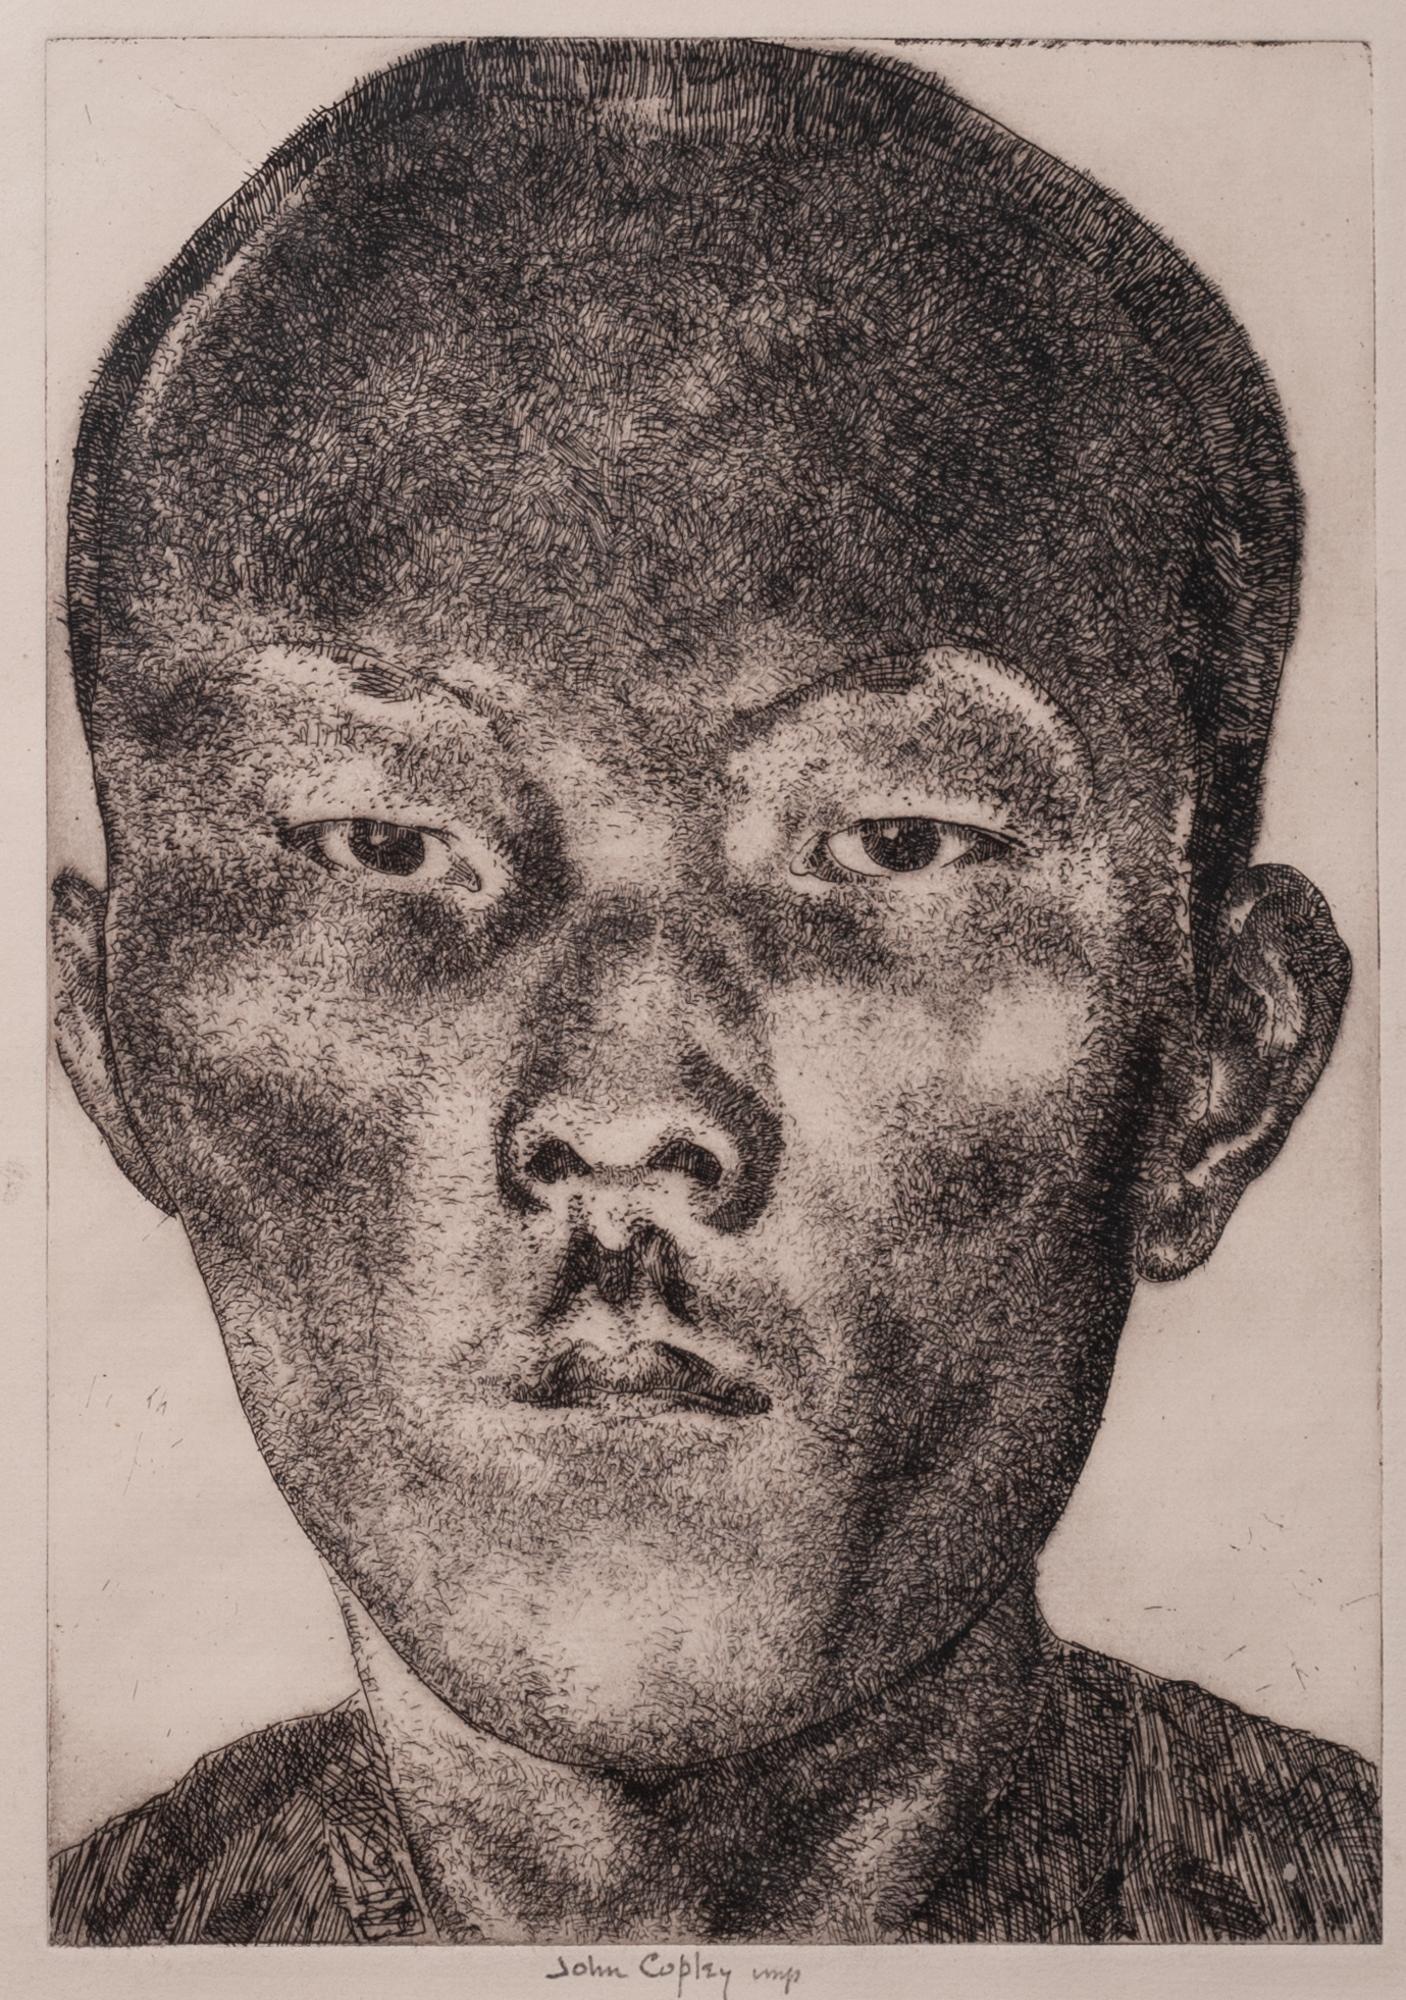 Lot 325 - JOHN COPLEY (1875-1950) ARTIST SIGNED ETCHING Oriental head study 10? x 7? (25.4cm x 17.8cm)